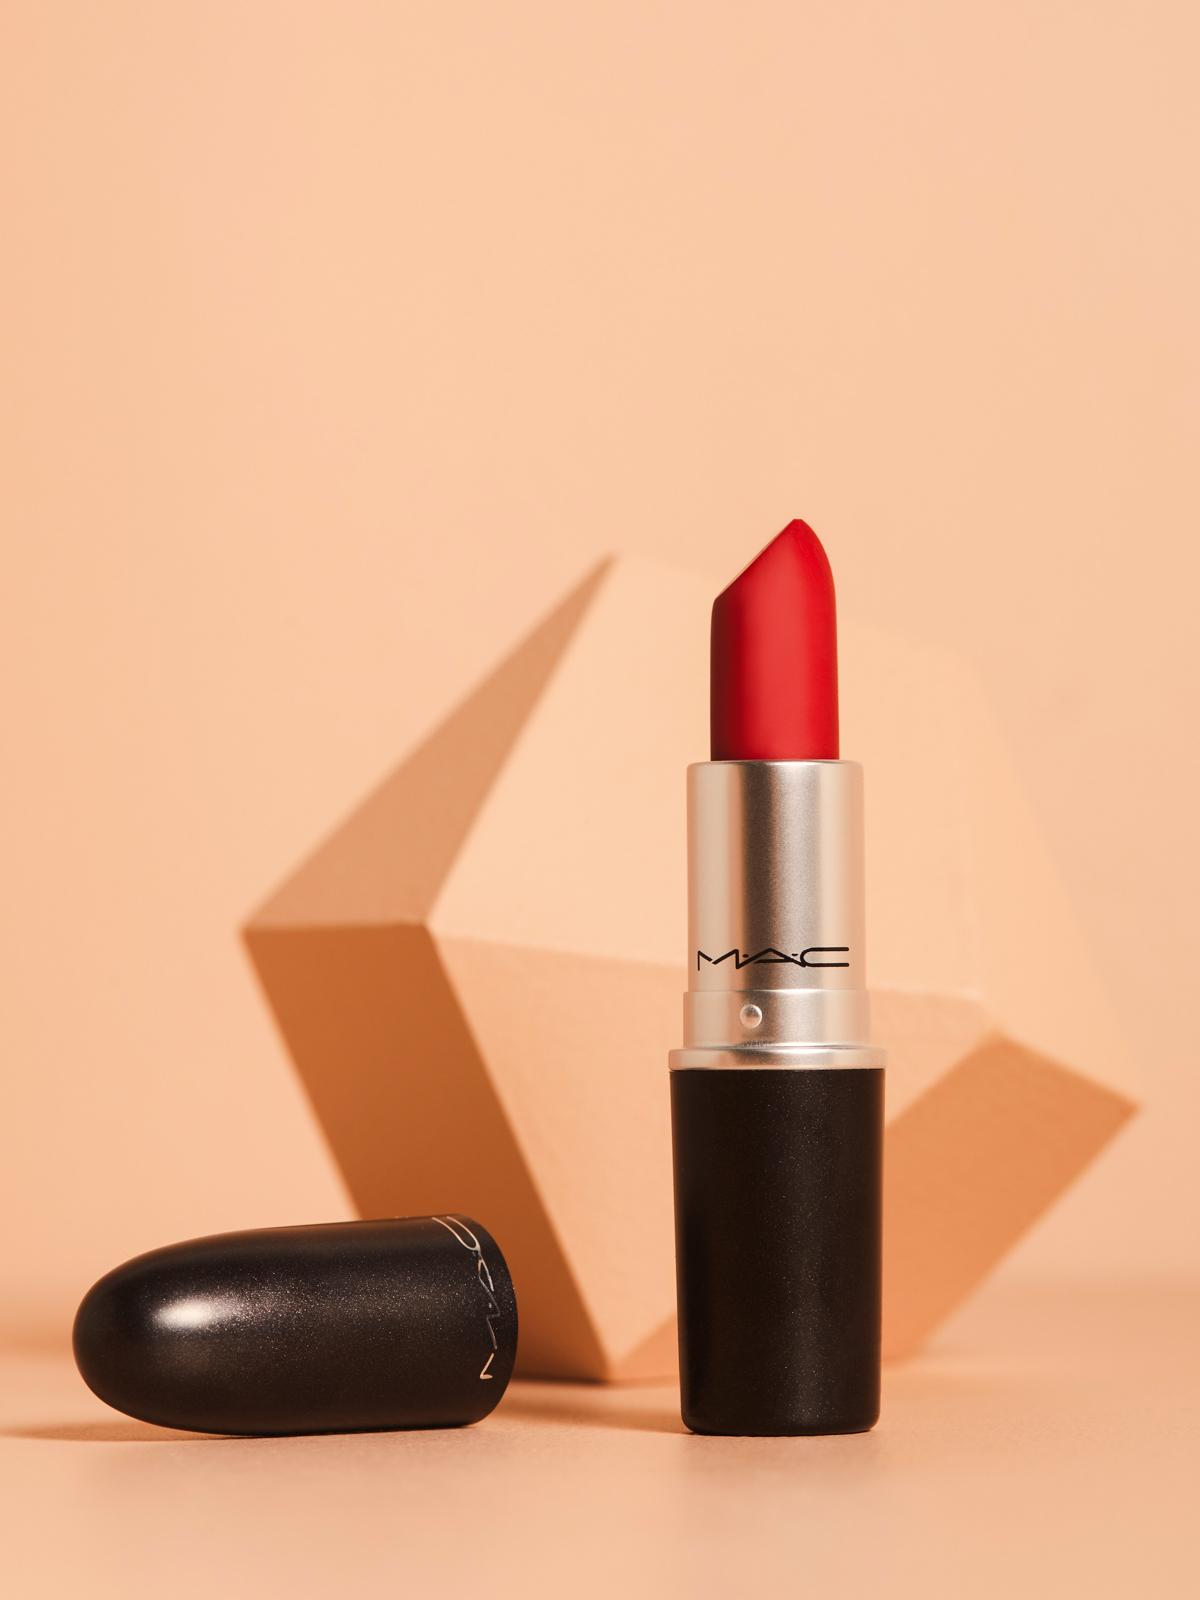 Currant Magazine presents a beauty holy grail: MAC Retro matte lipstick.